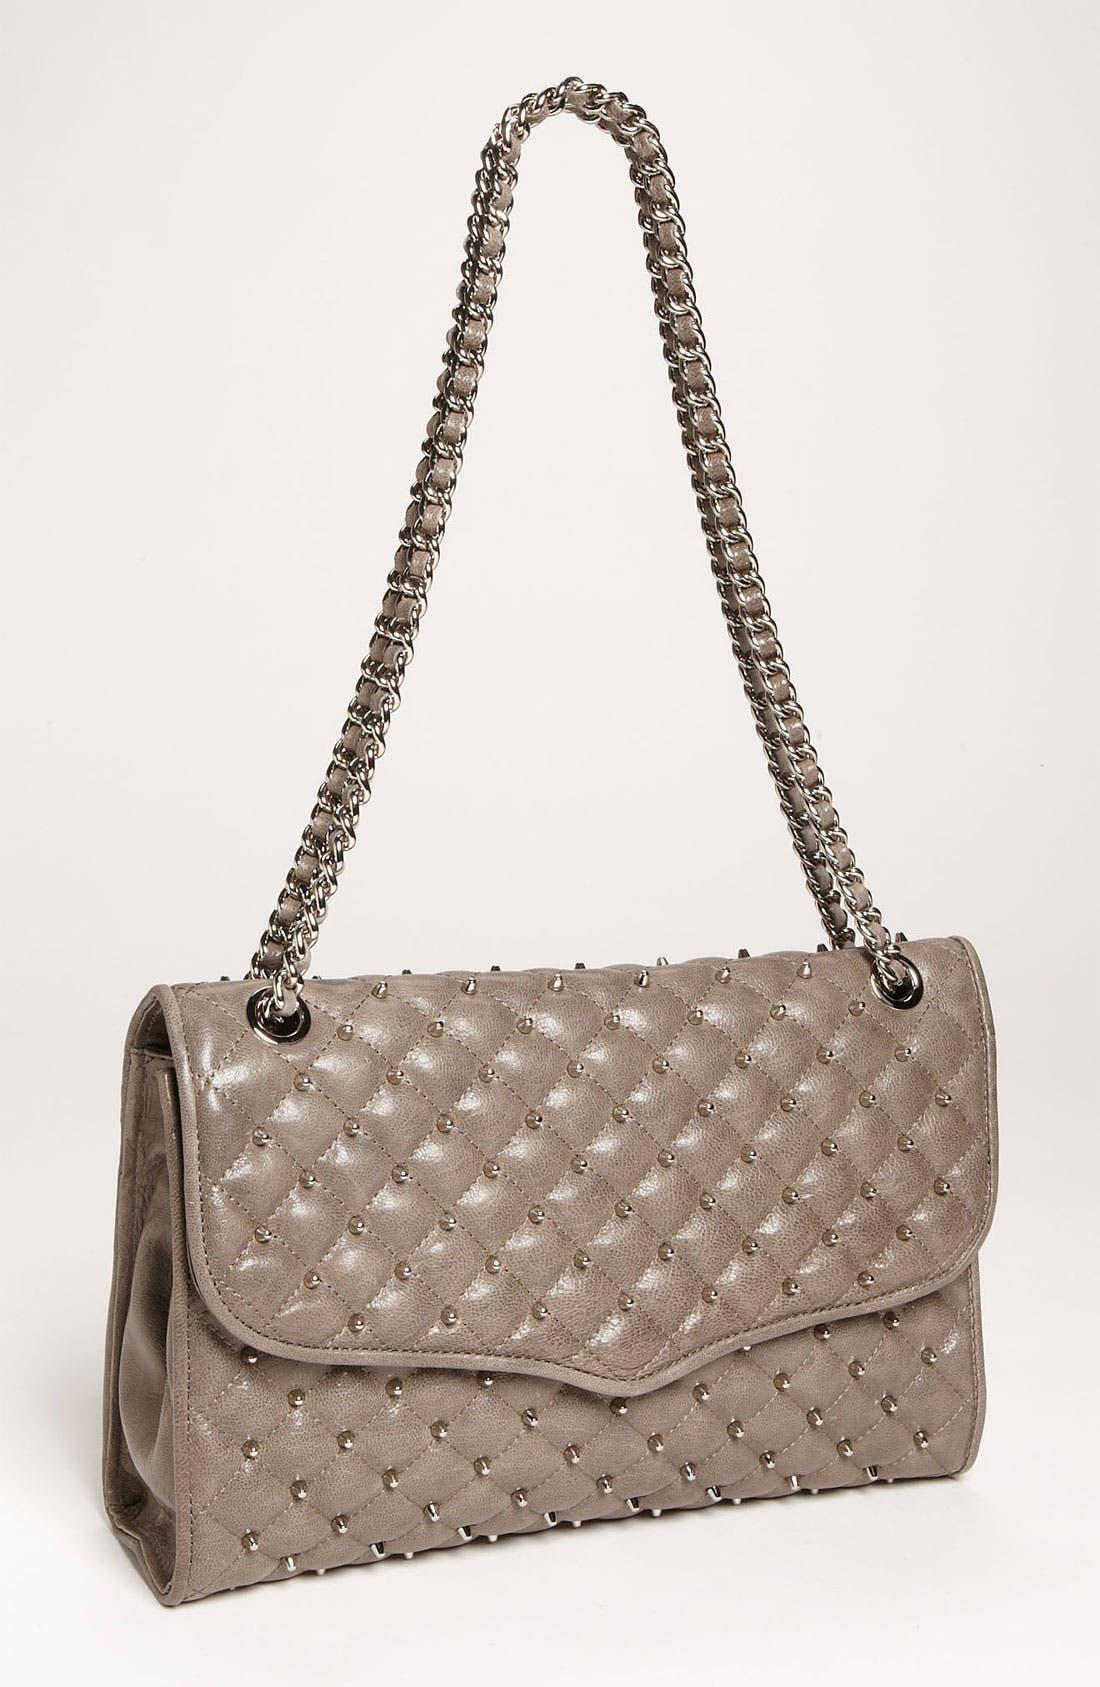 Main Image - Rebecca Minkoff 'Affair - Large' Double Chain Shoulder Bag